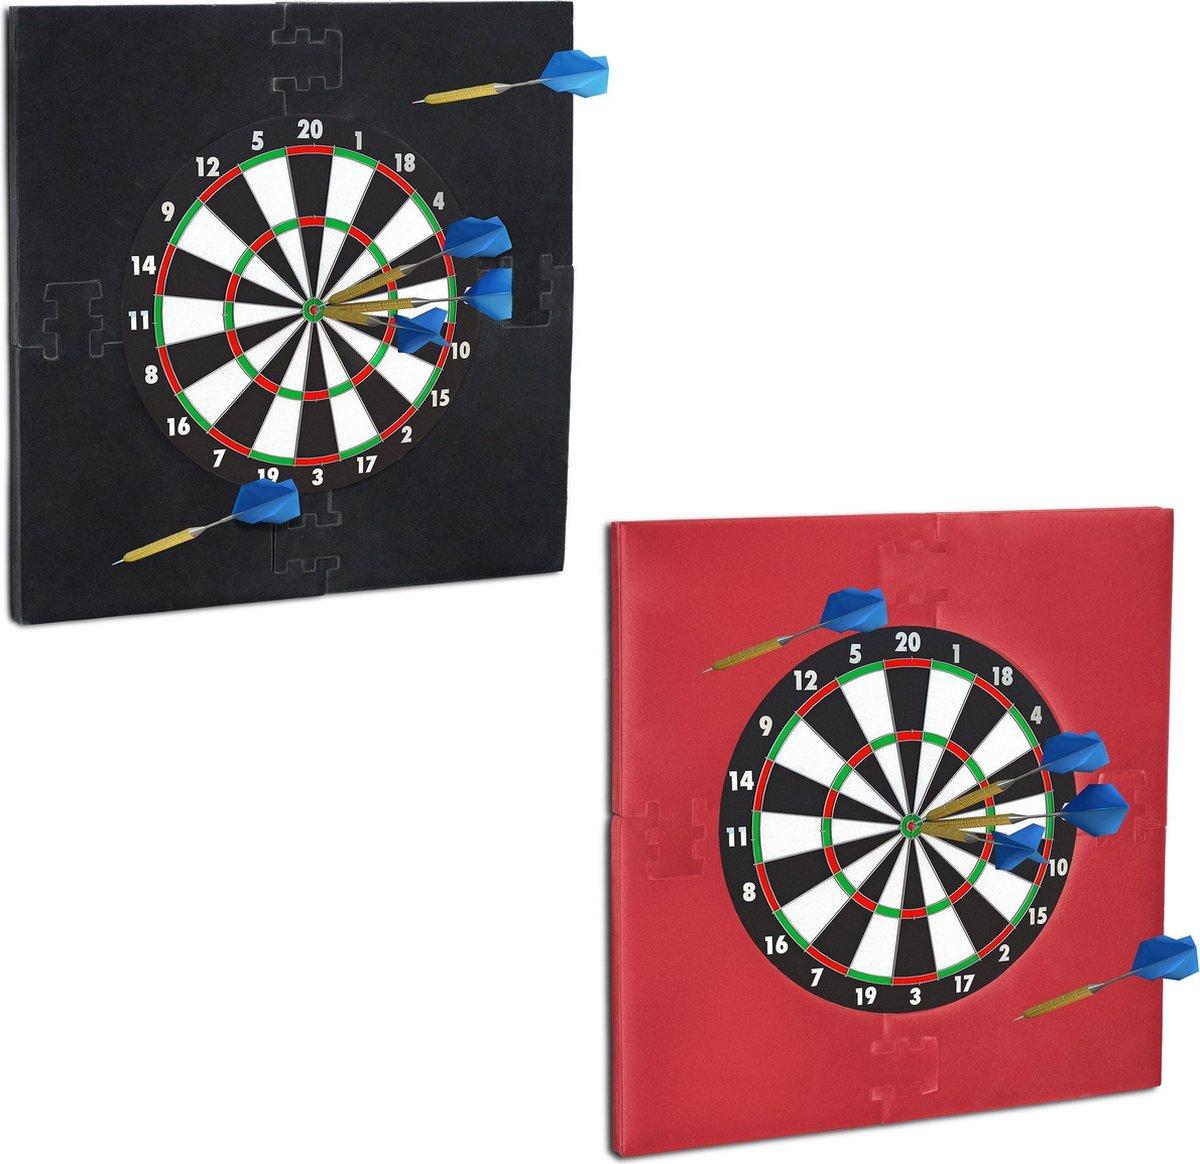 relaxdays dartbord surround ring - beschermrand - beschermring - ring voor dartbord - 45cm groen